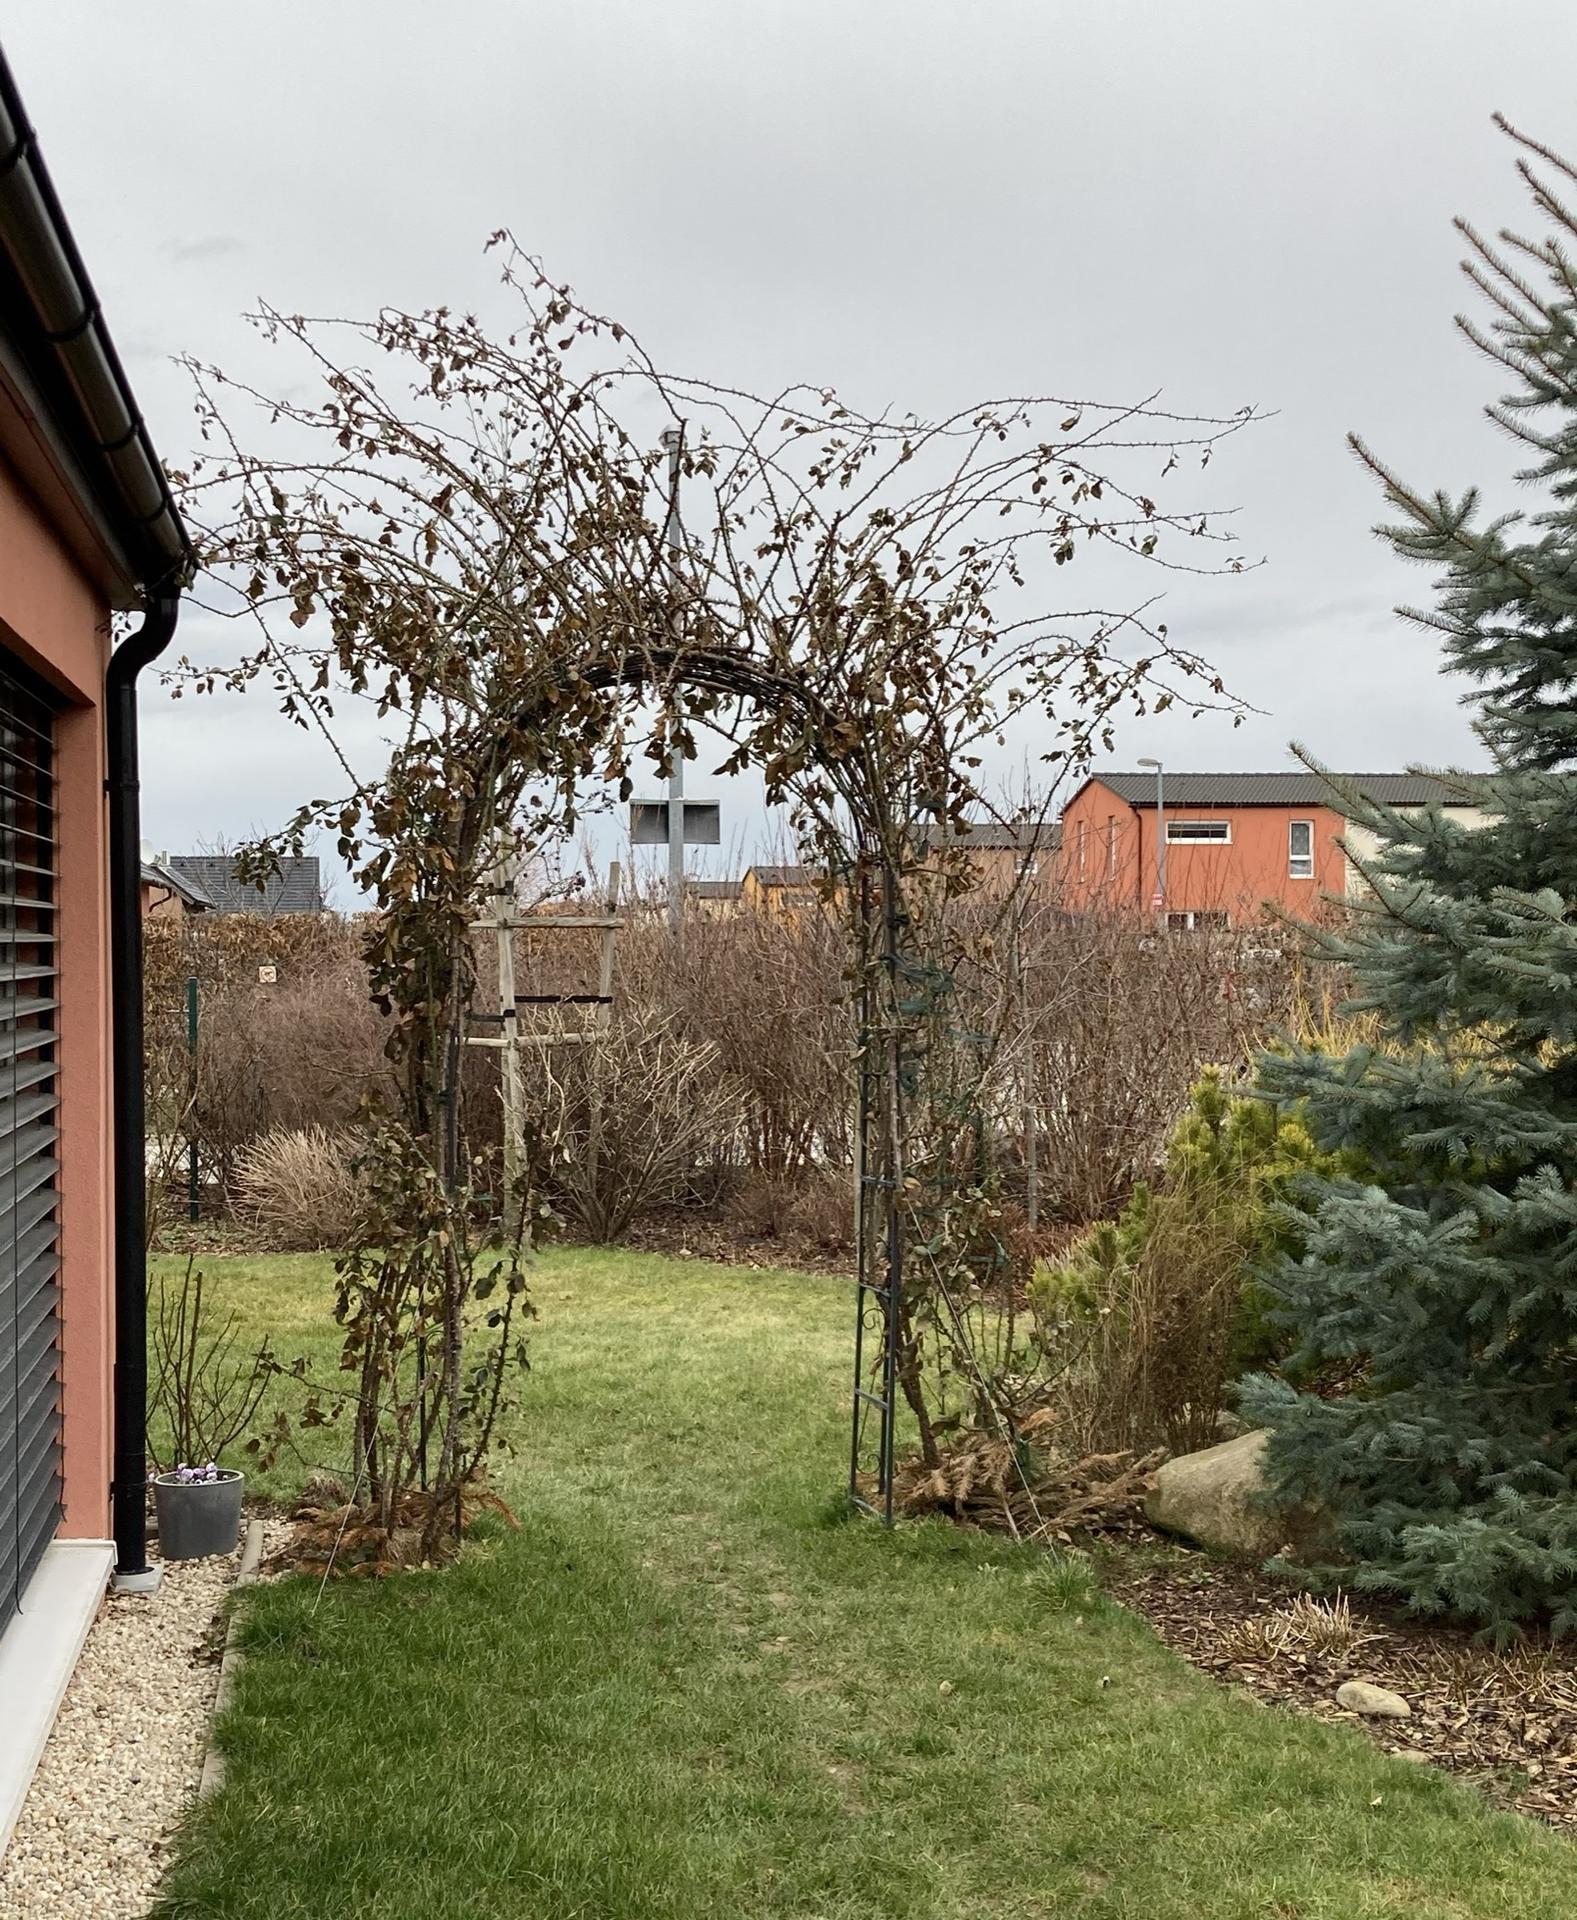 Zahrada 2021 - Obrázek č. 18